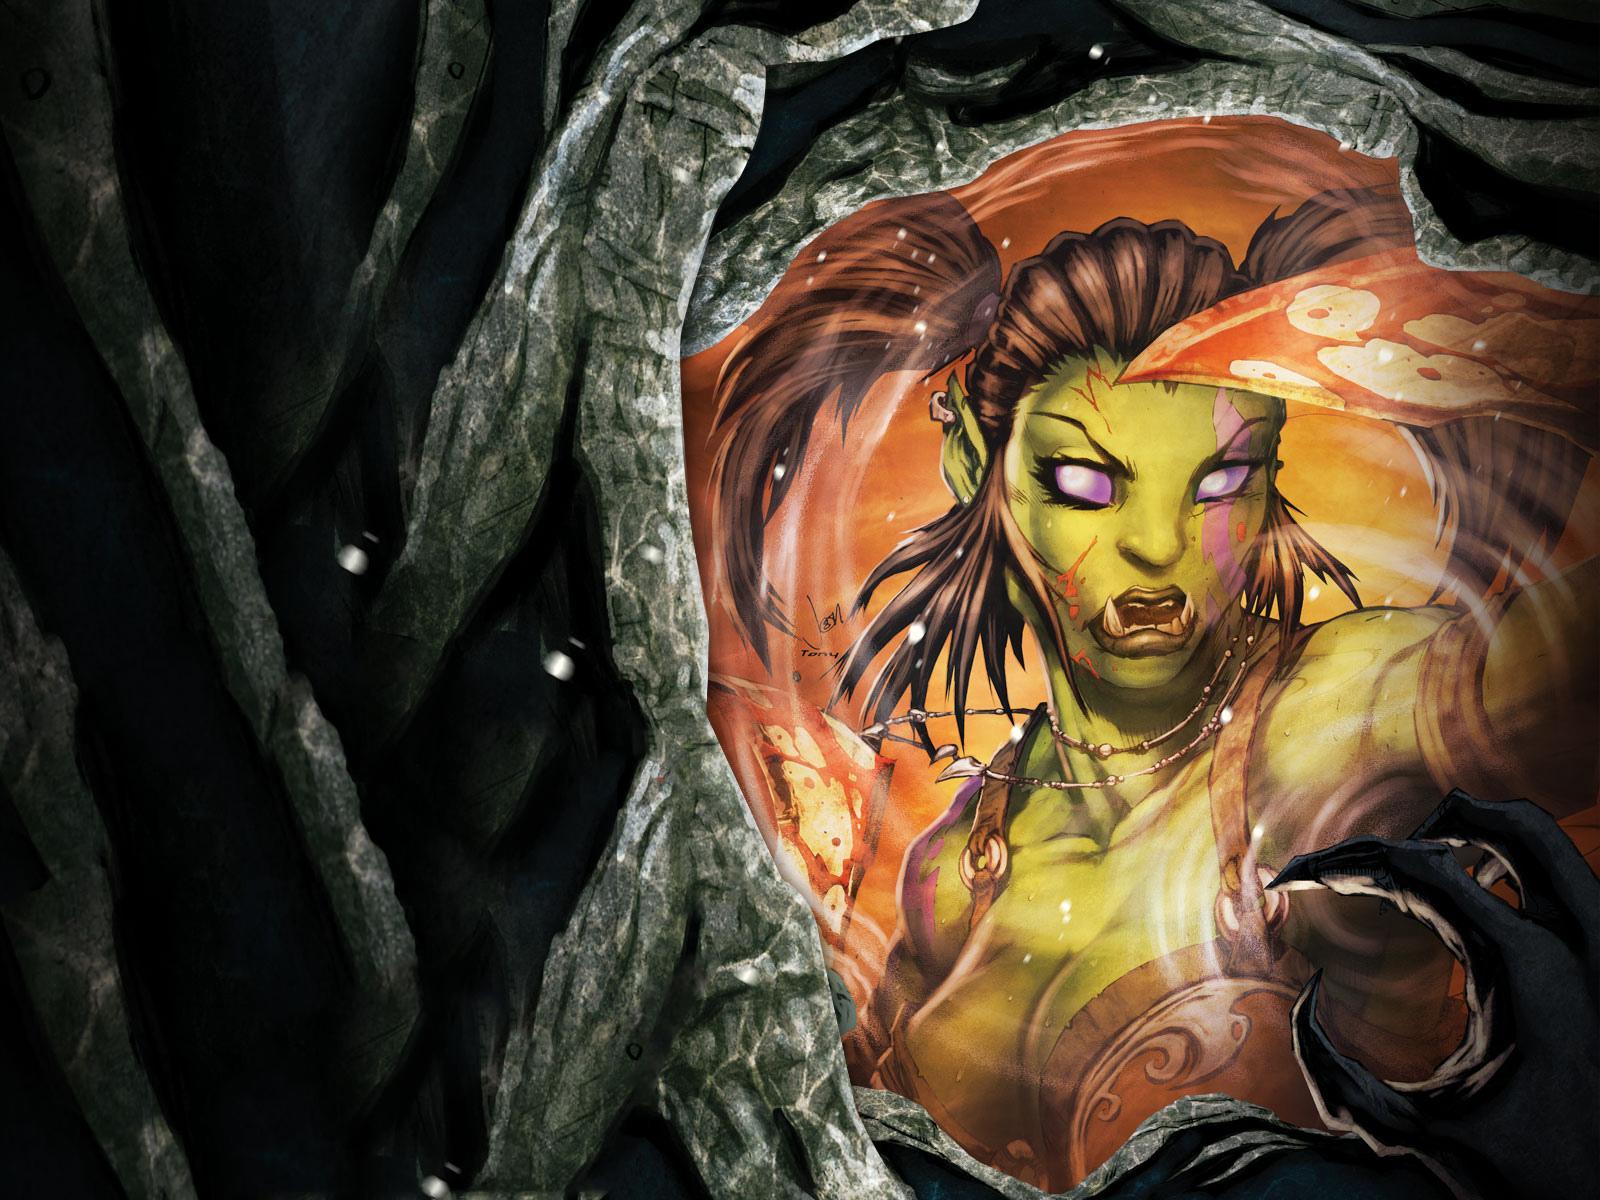 Warcraft Comics wallpapers HD quality